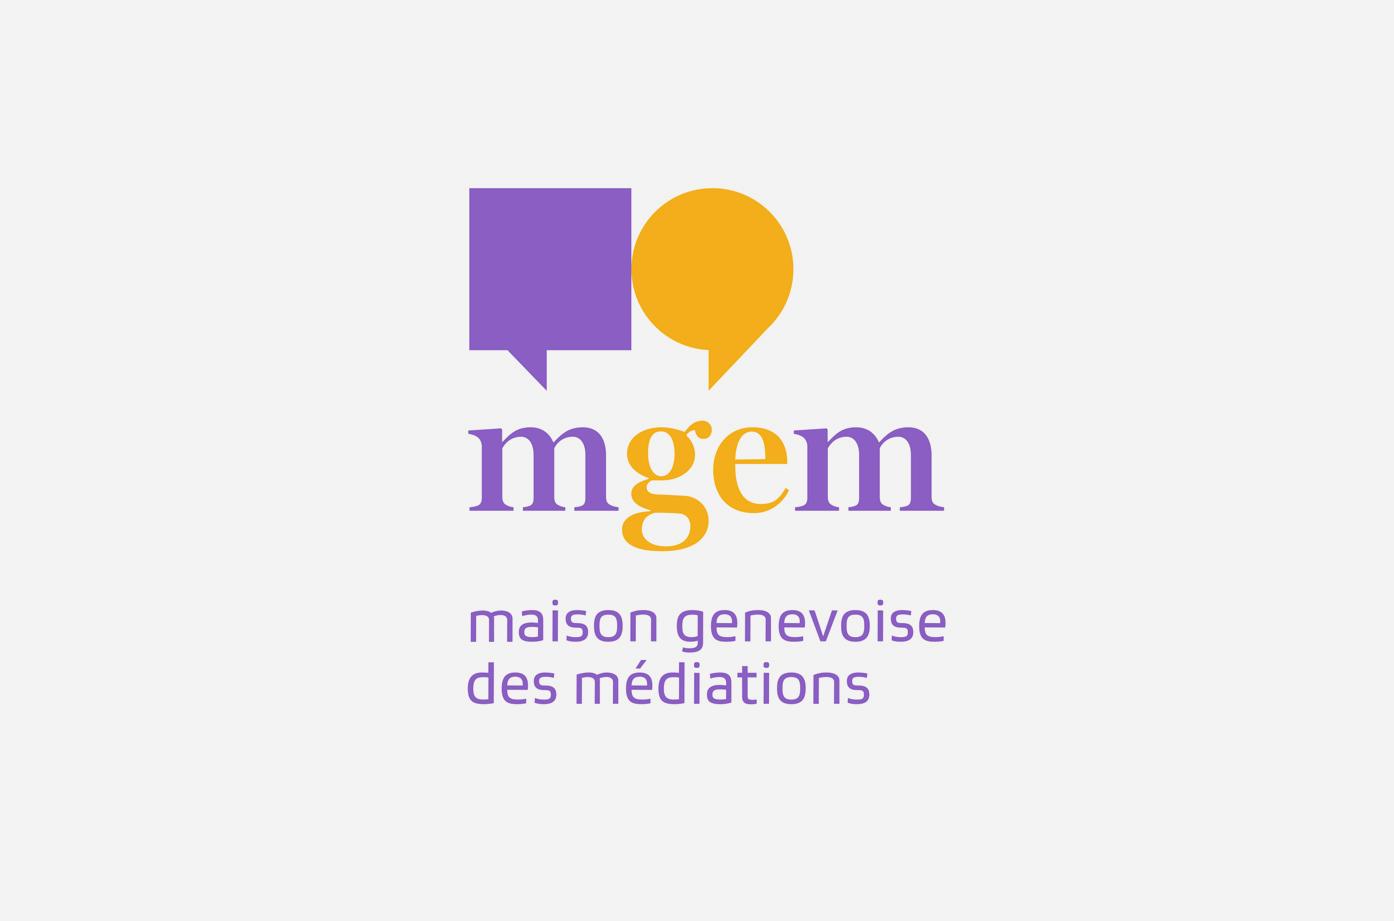 Maison-genevoise-mediation-Identite-Logotype-Graphique-Sophie-Jaton